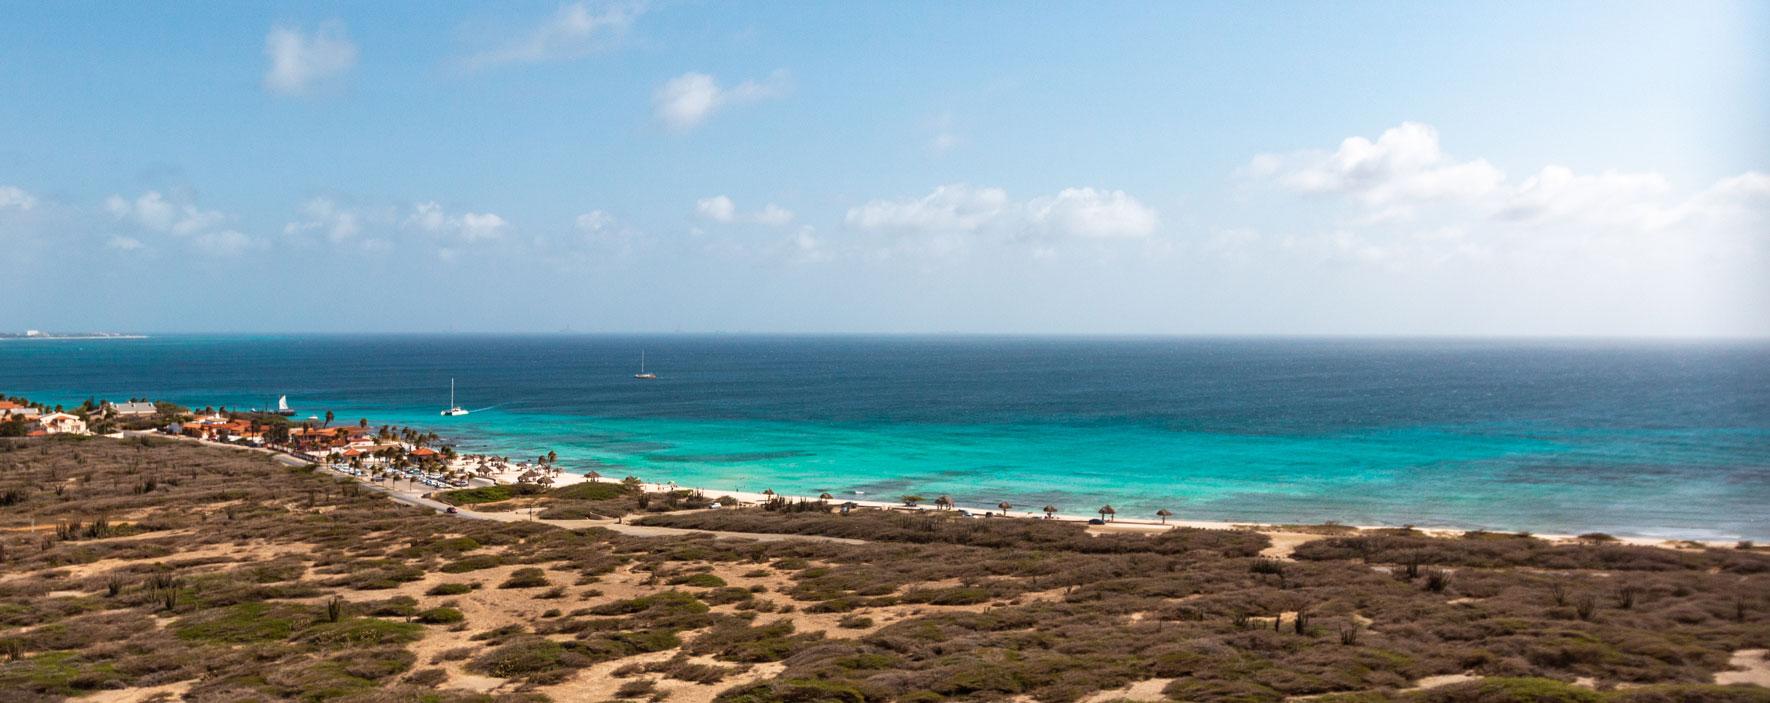 Aussicht vom California Lighthouse, Aruba.